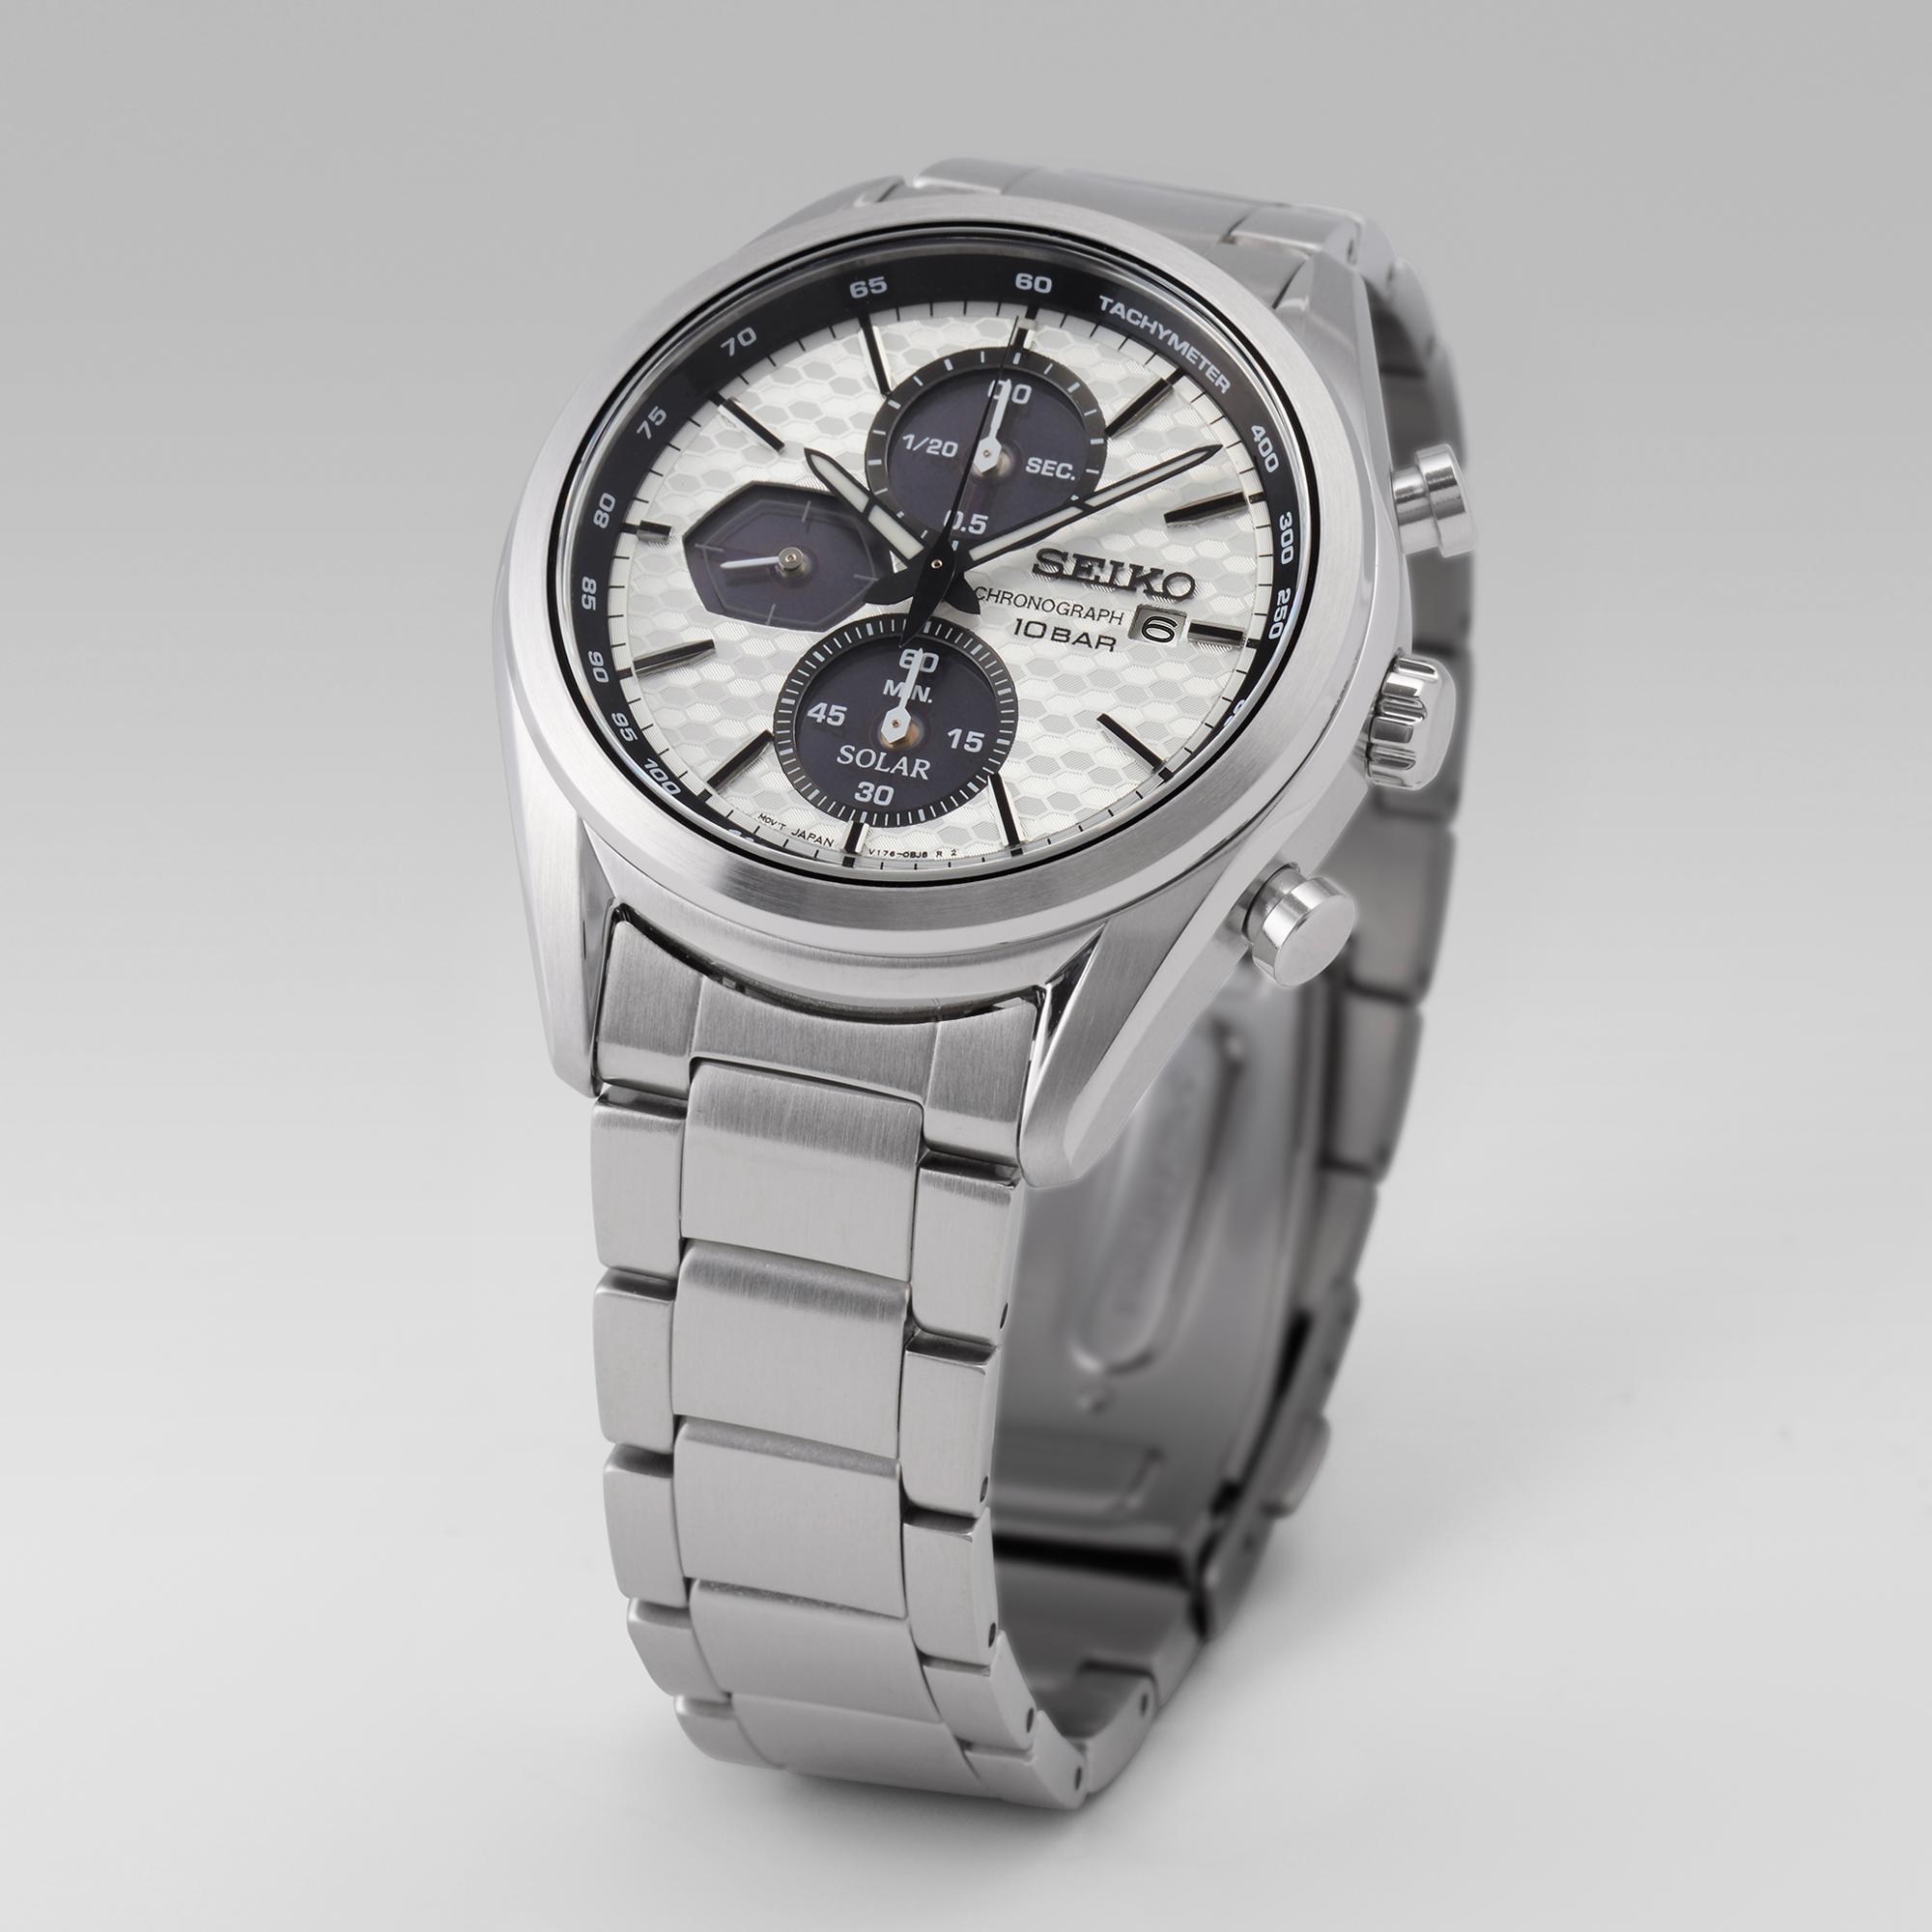 https://0501.nccdn.net/4_2/000/000/05a/a3f/ssc769p1-seiko-solar-chronograph-macchina-sportiva.jpg